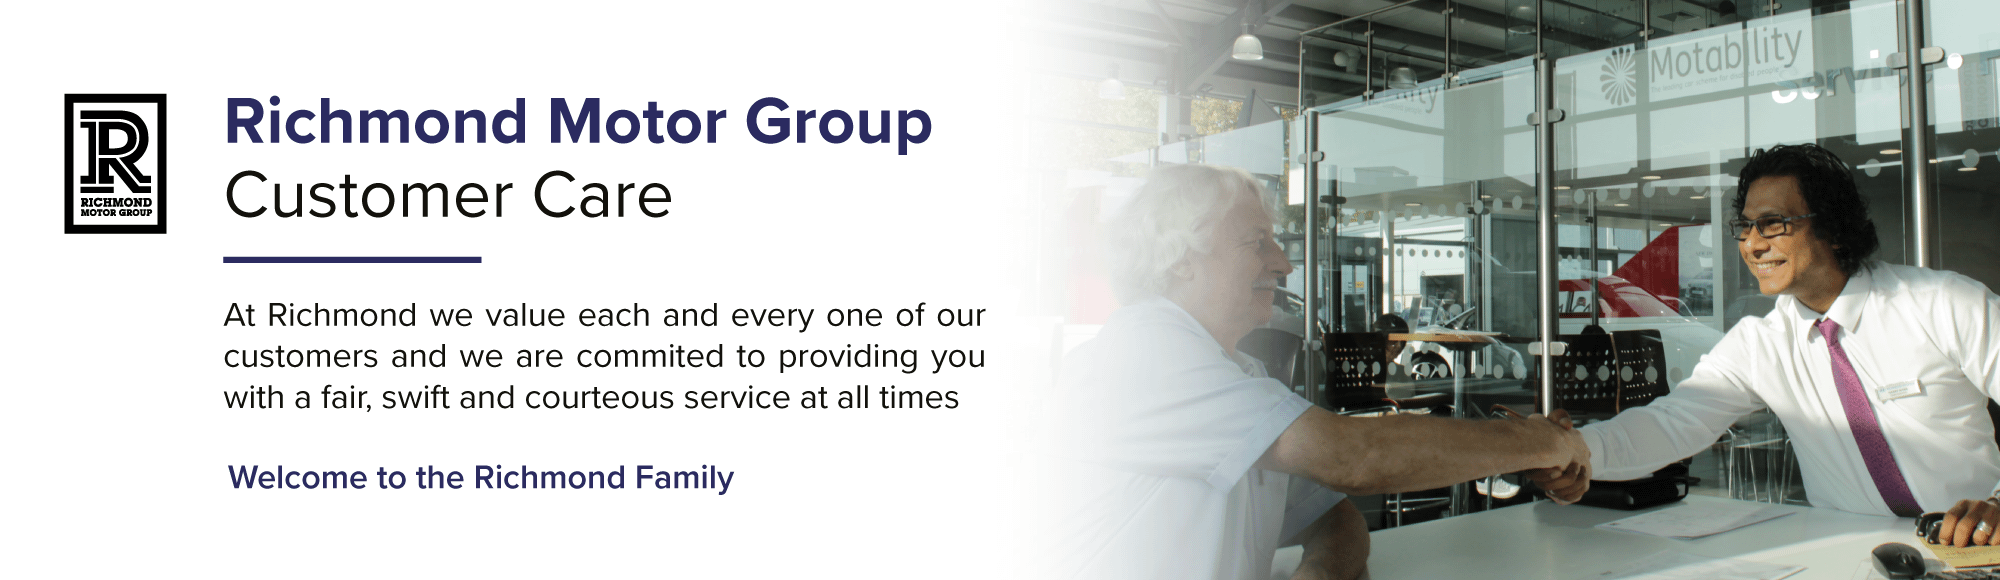 Richmond Motor Group Customer Care